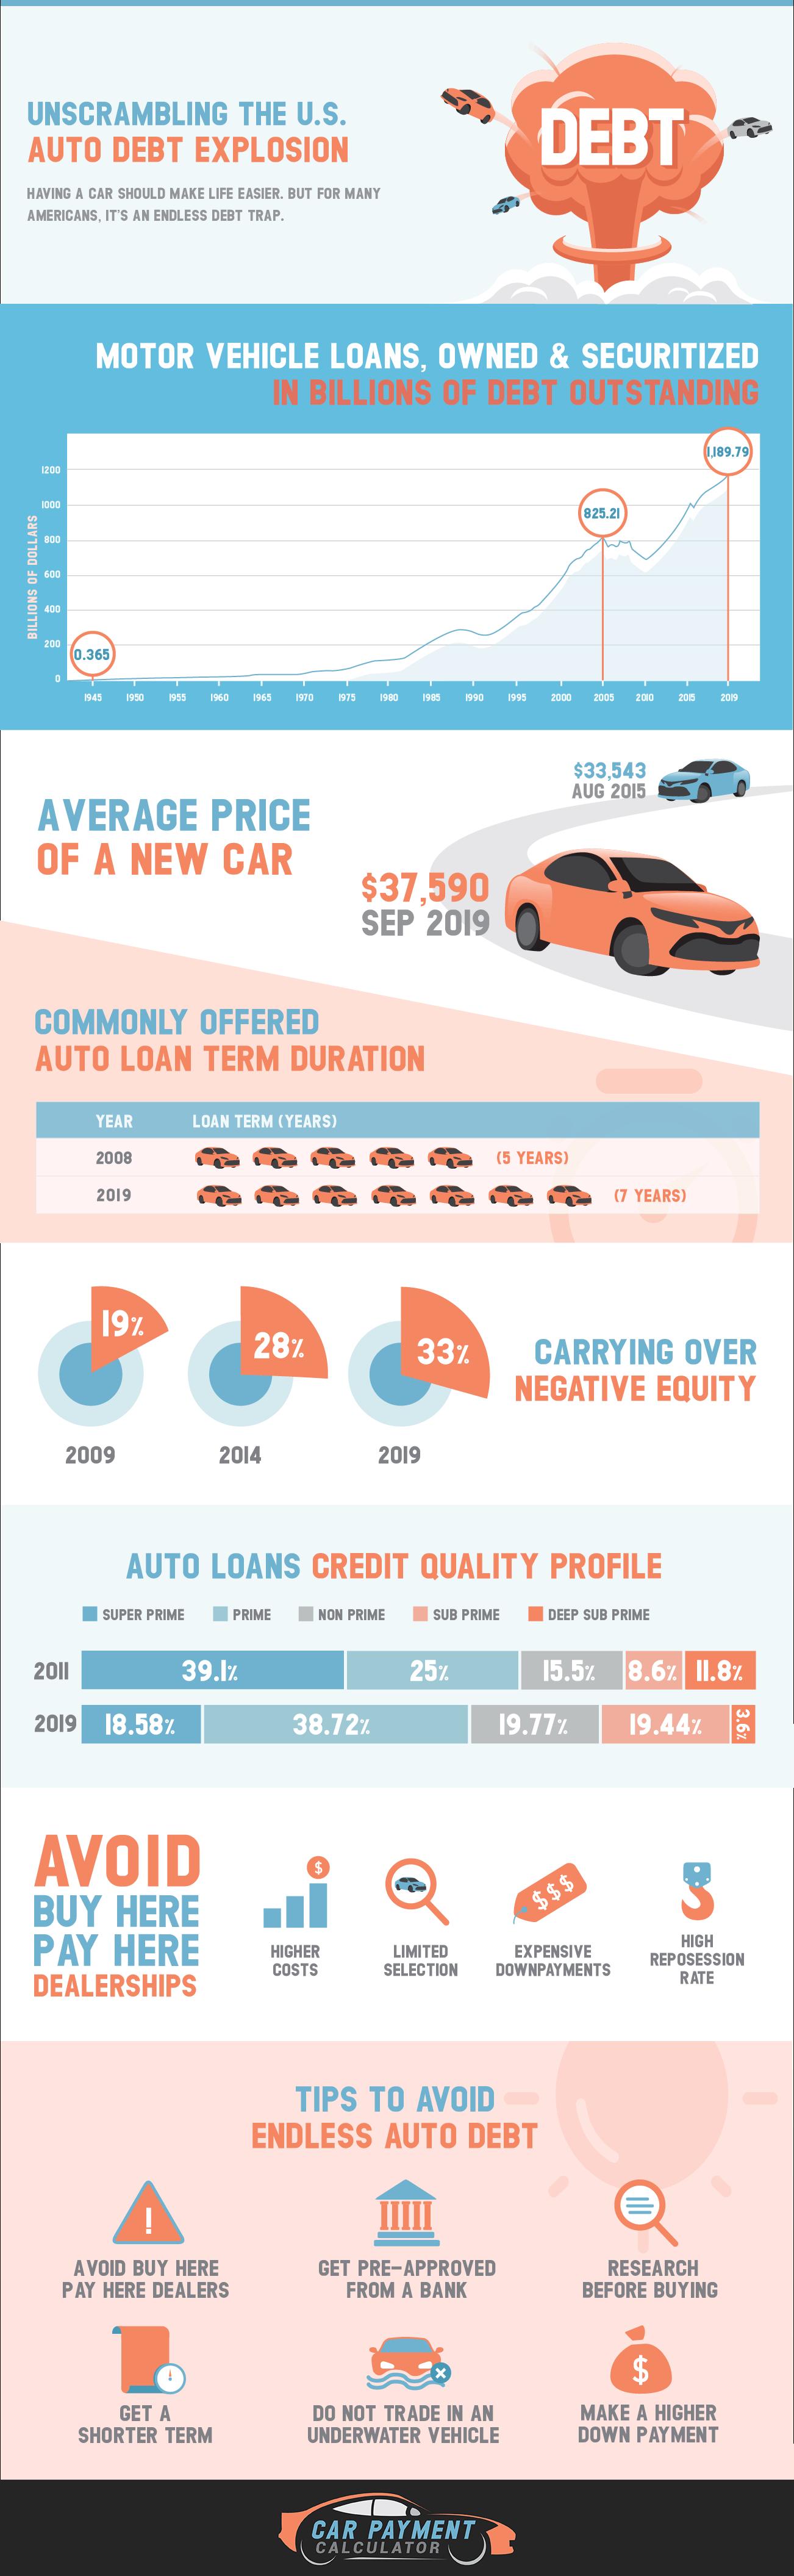 Never Ending Auto Debt